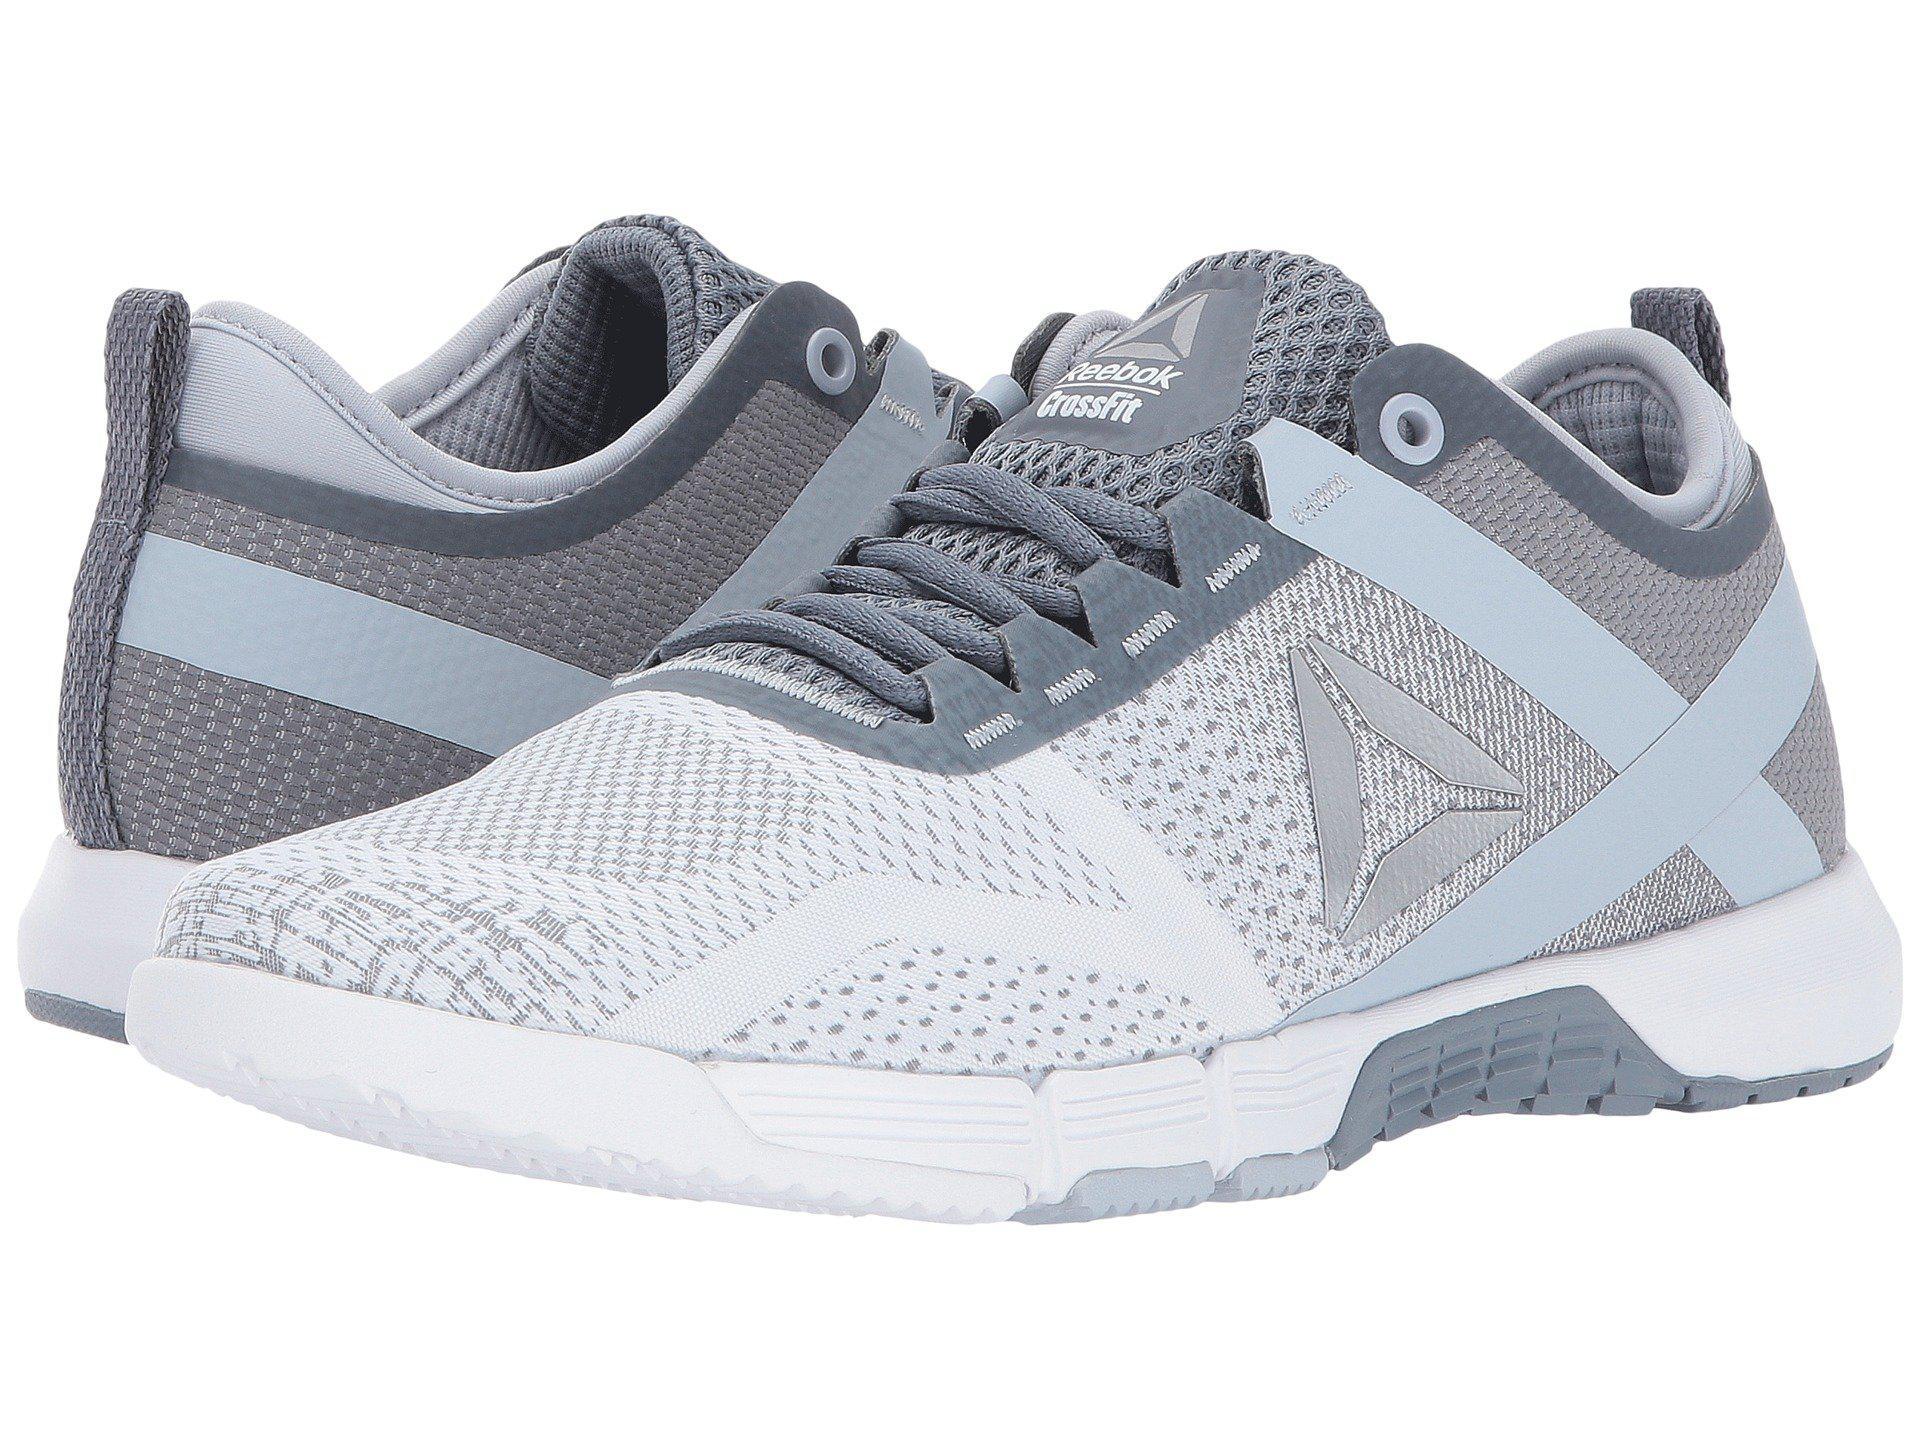 8668f9e15203e2 Lyst - Reebok Crossfit Grace Tr Track Shoe in Gray for Men